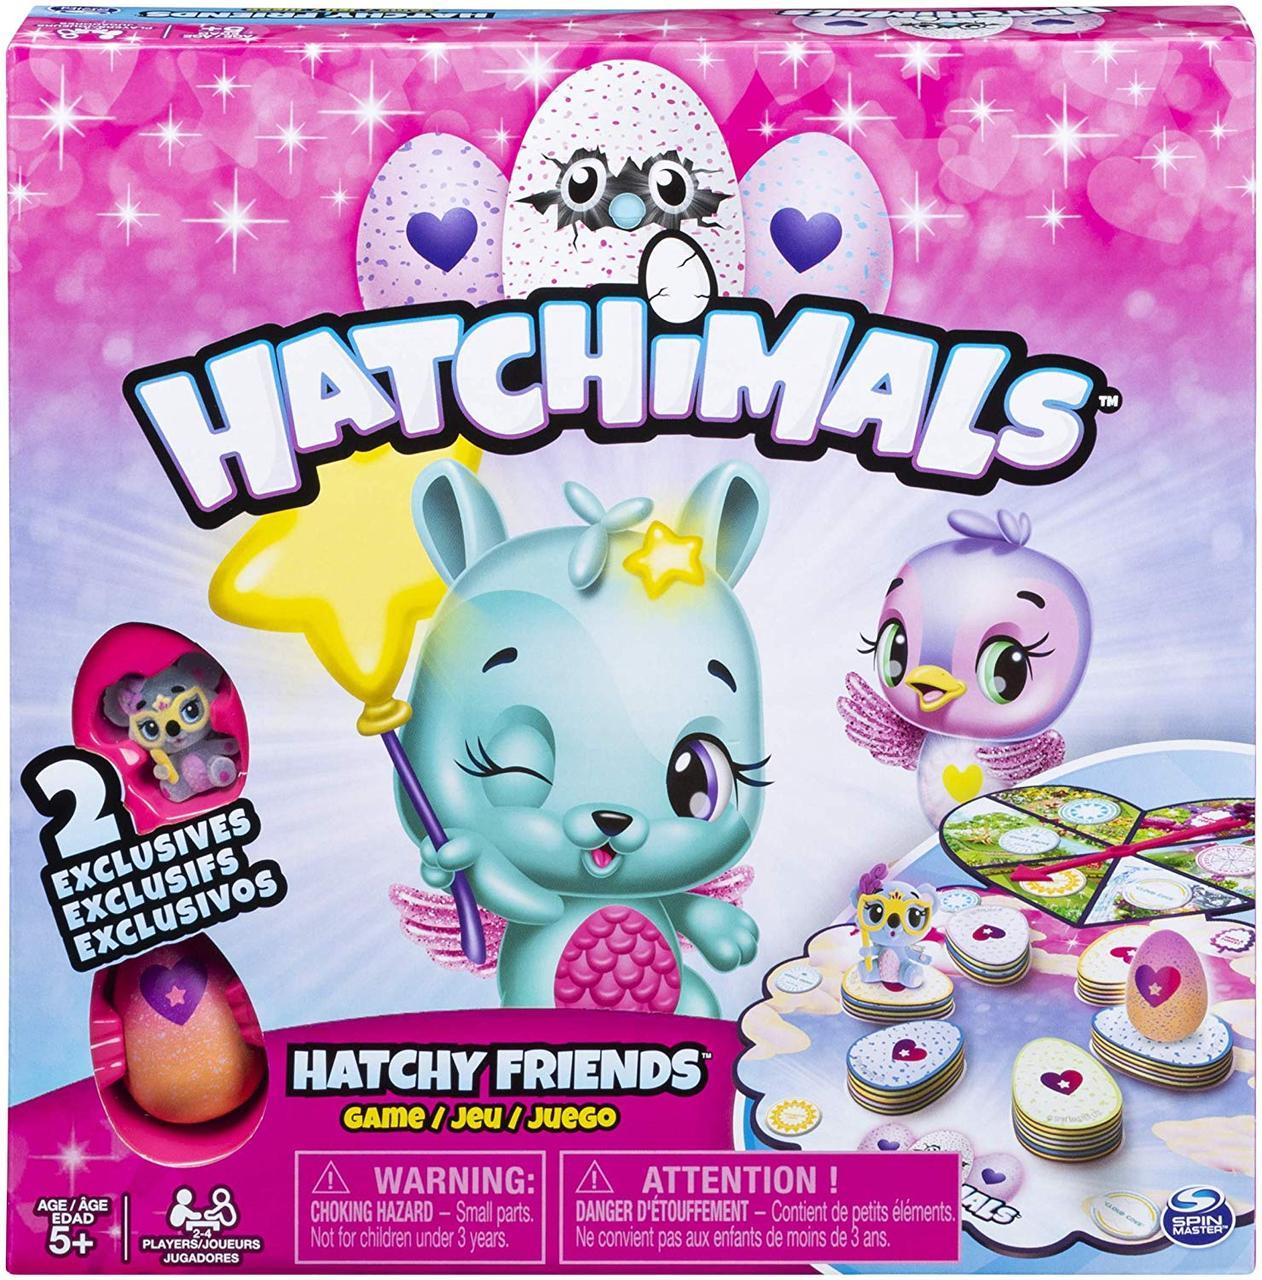 Spin Master Настольная игра с двумя фигурками 6046202 Games Hatchimals Hatchy Friends Game